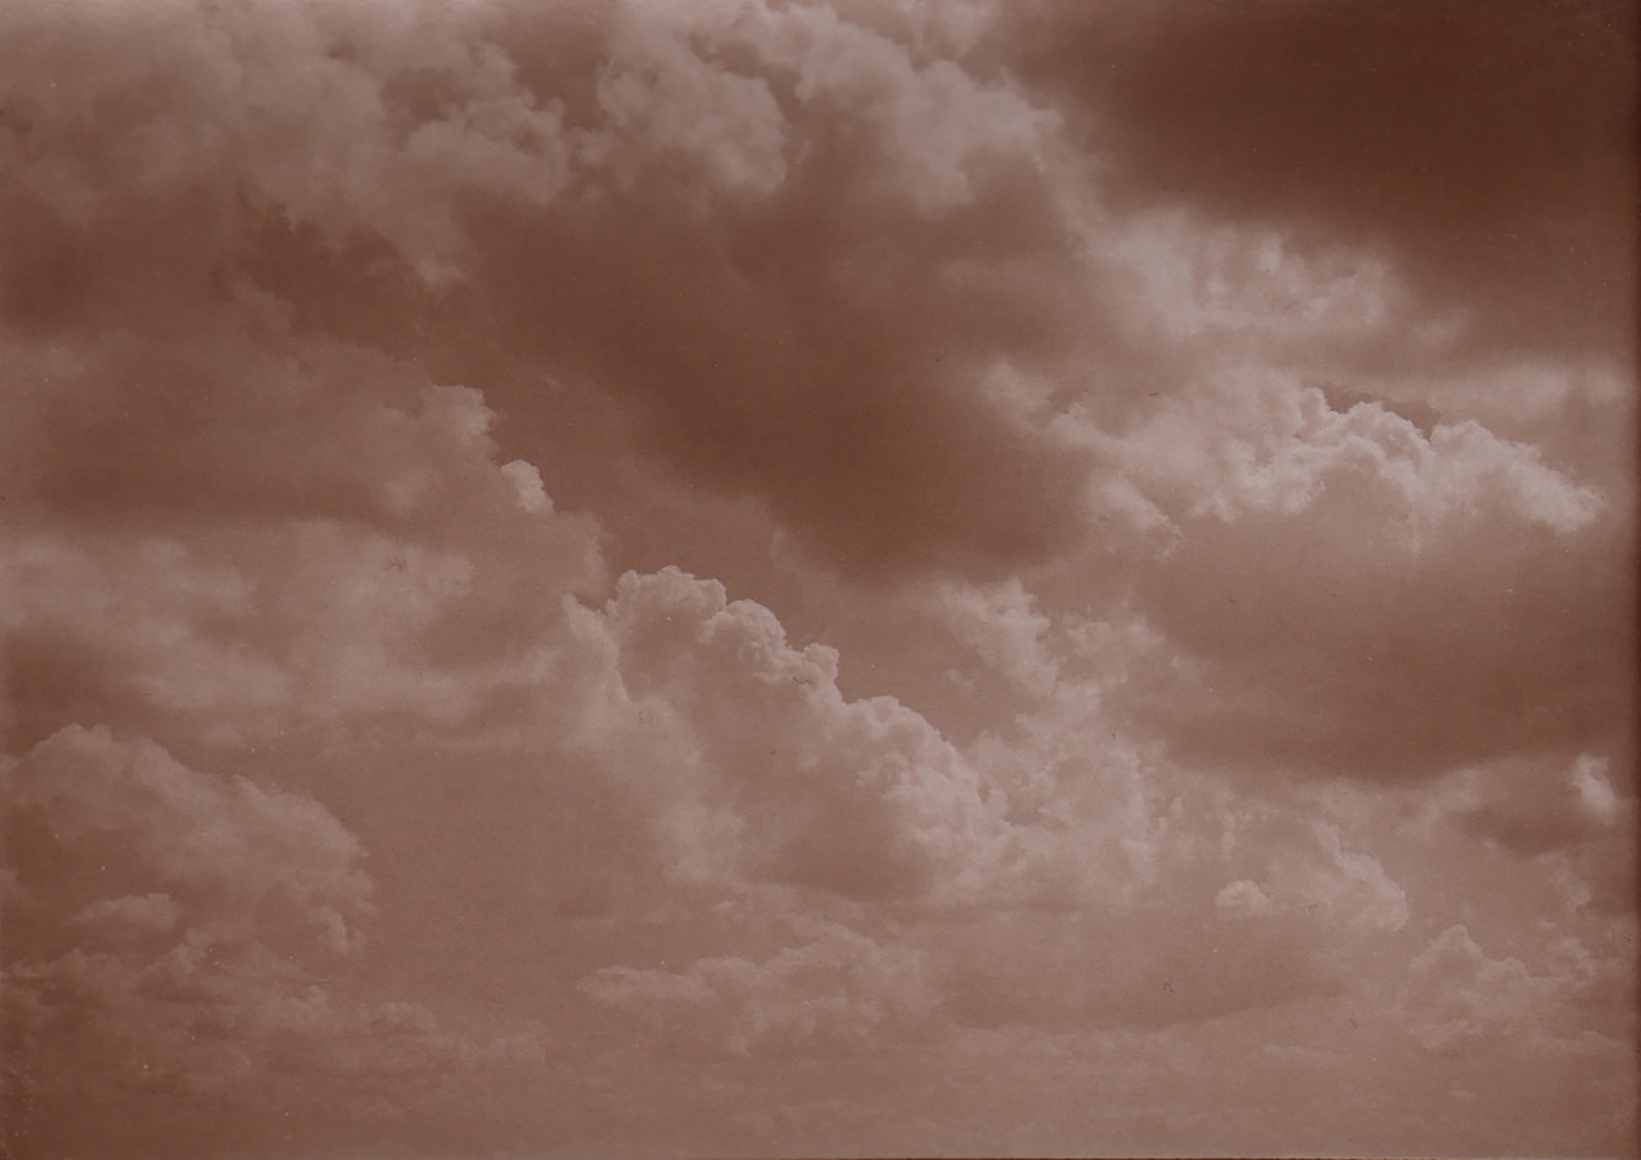 31. Léonard Misonne, Untitled, c. 1930. Cloud-filled sky. Sepia-toned print.